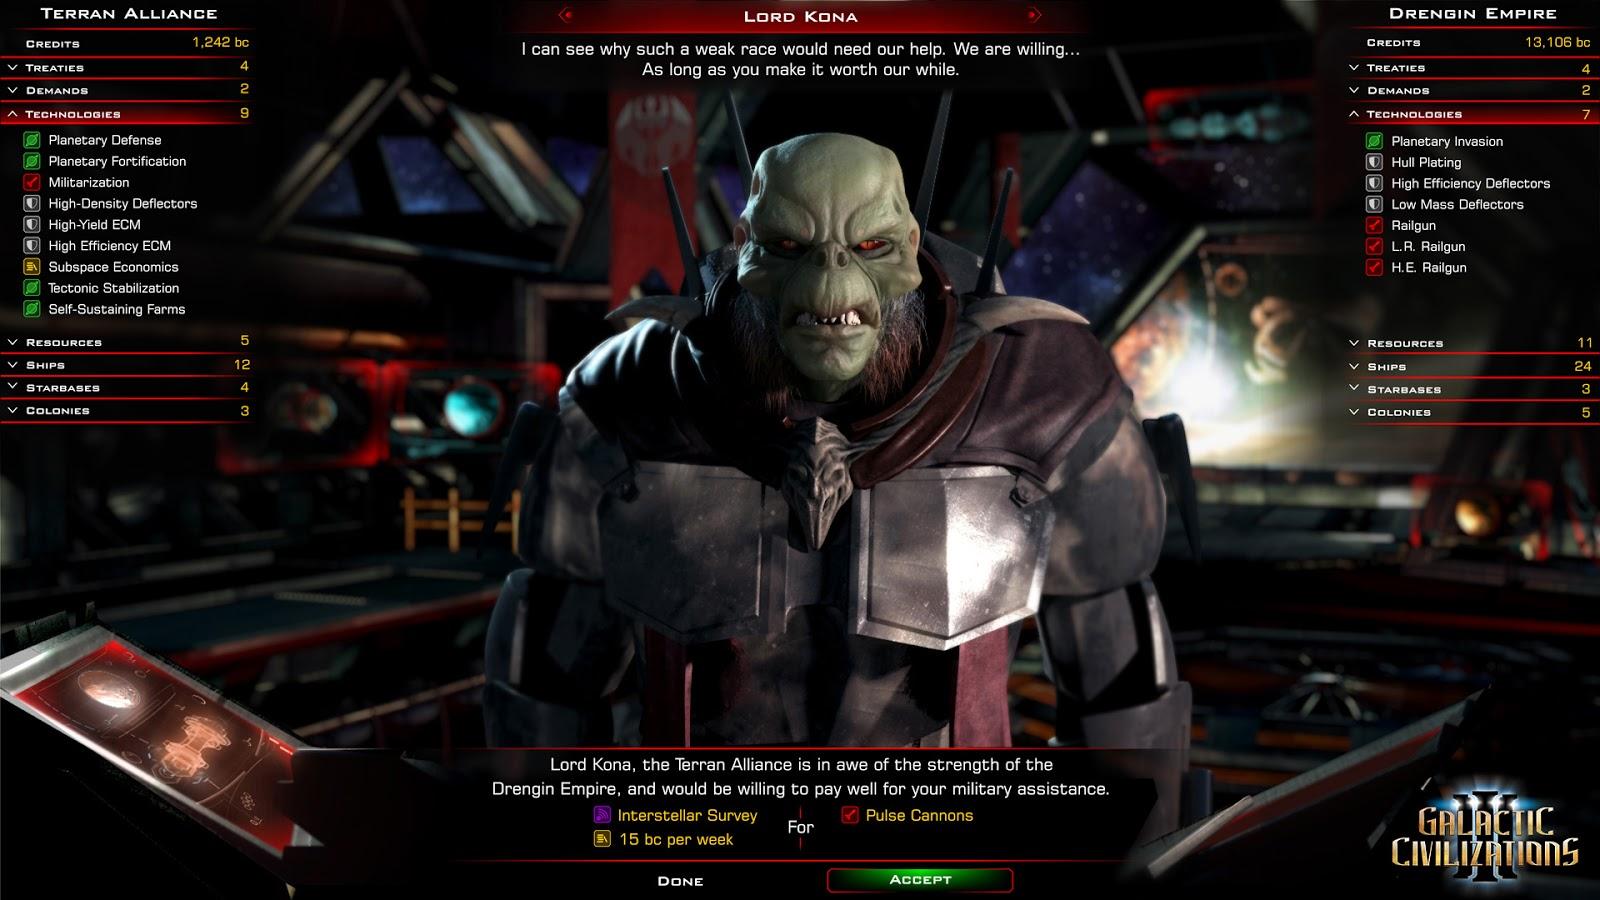 galactic civilizations iii 05 12 15 4 - Galactic Civilizations III 3